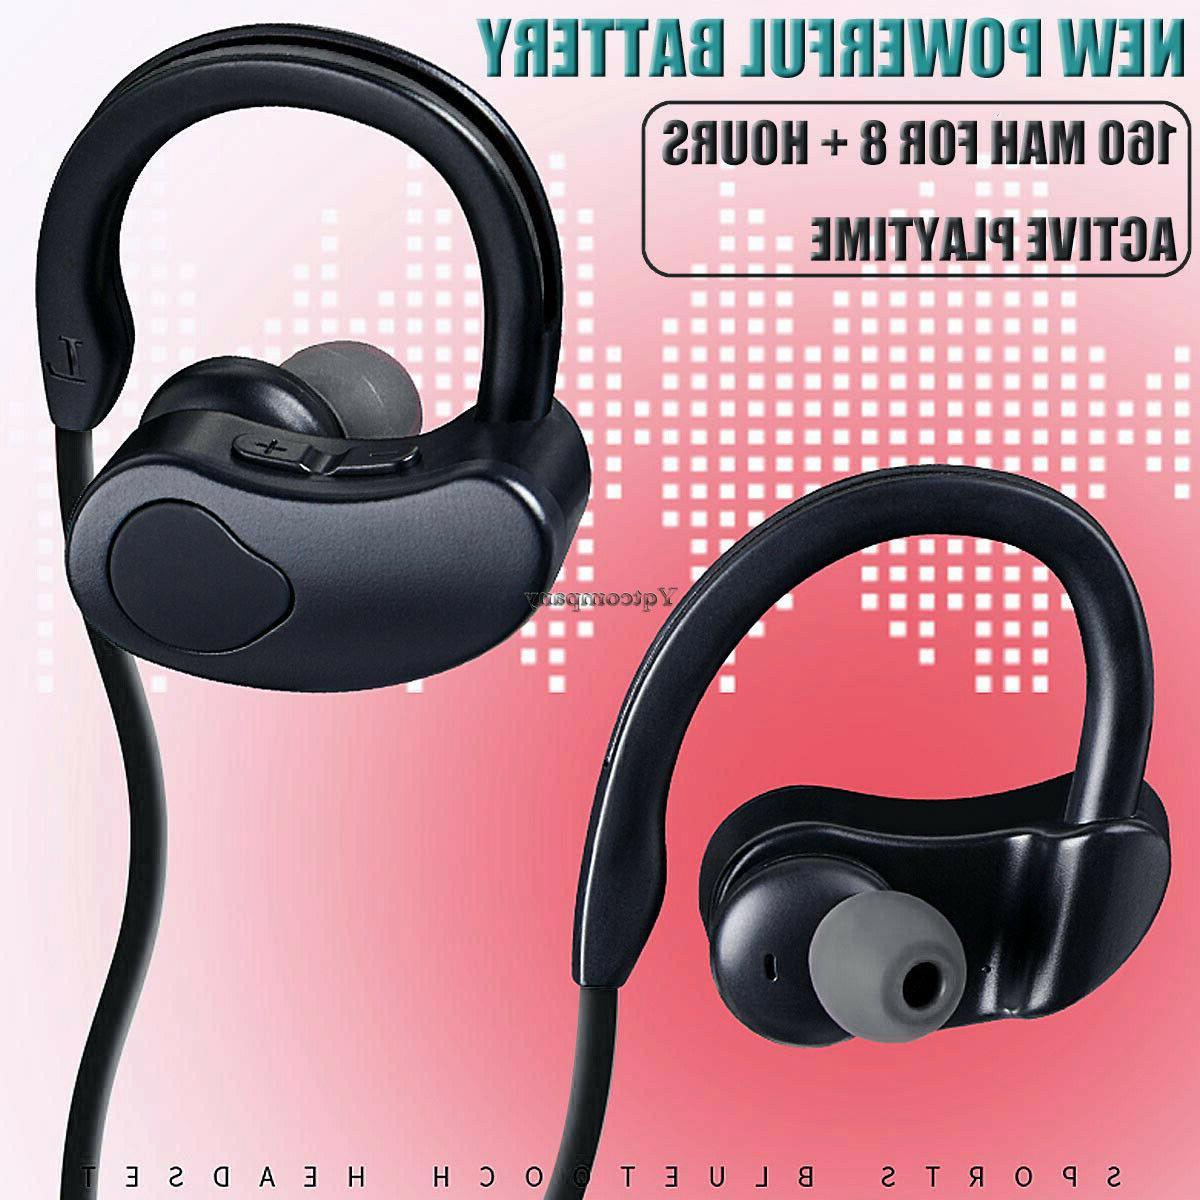 Wireless Earbuds Bluetooth Earphone Headphone For Samsung A1